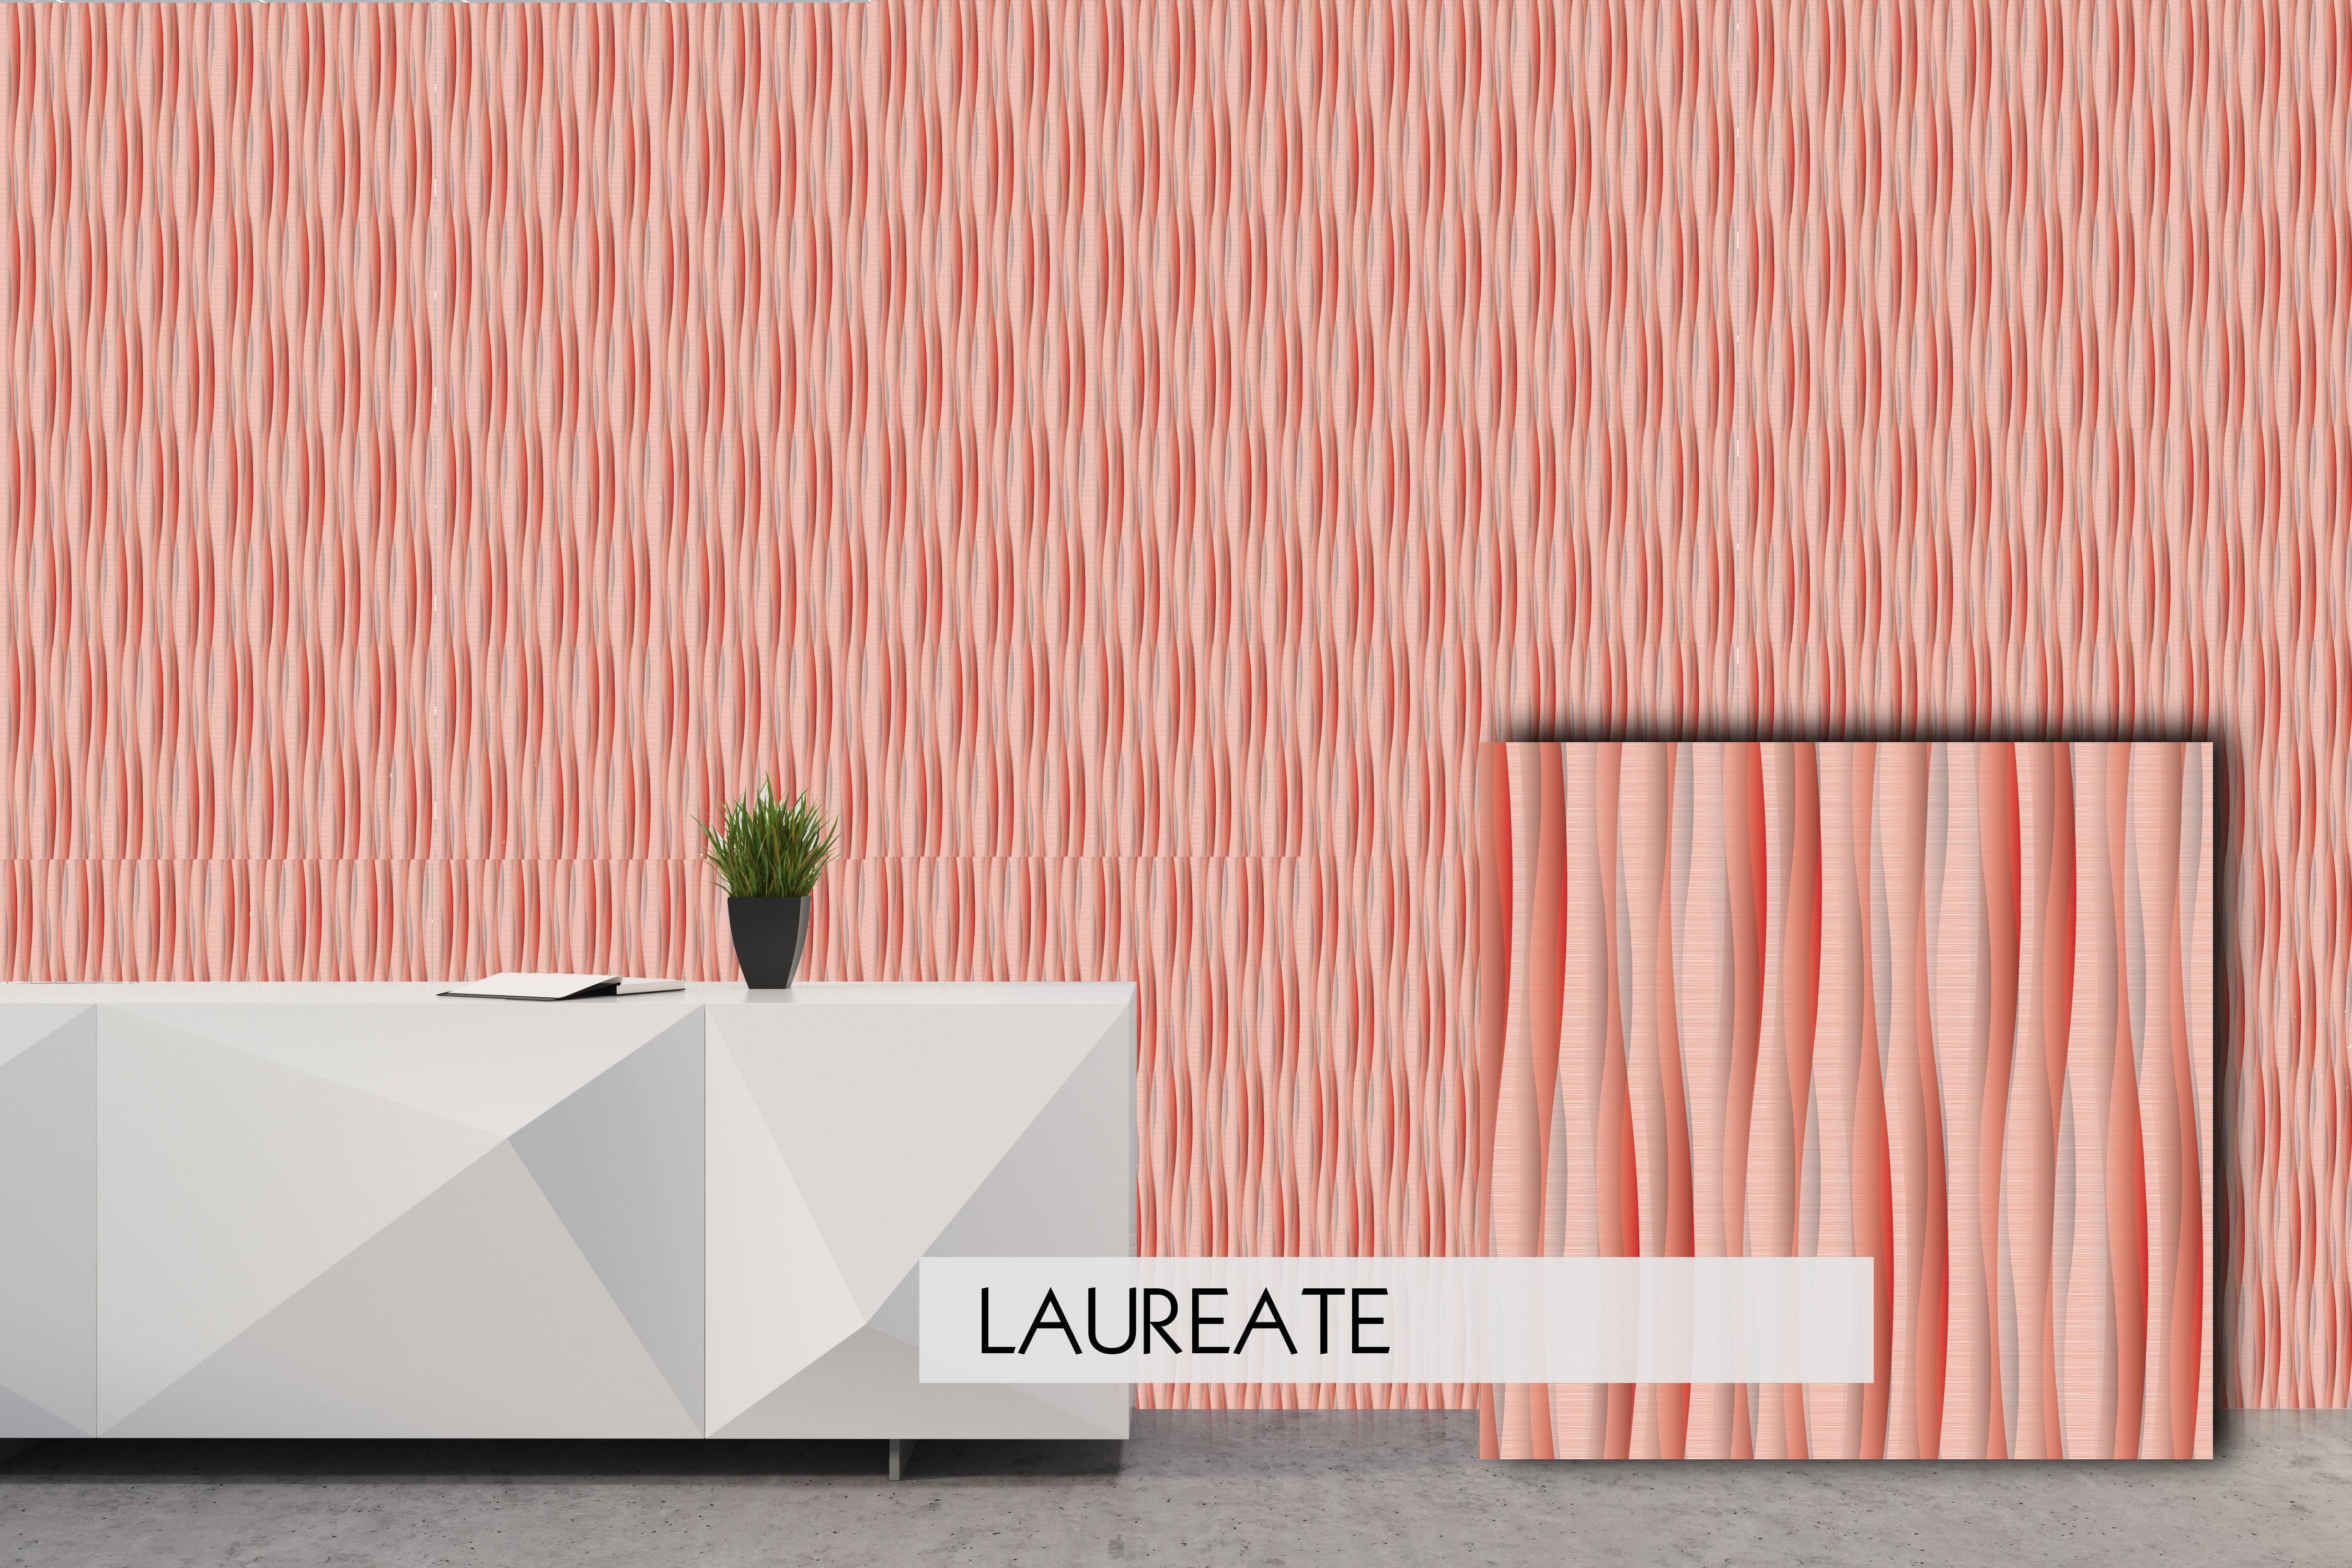 LEVEYart Digital LAUREATE Wallcovering